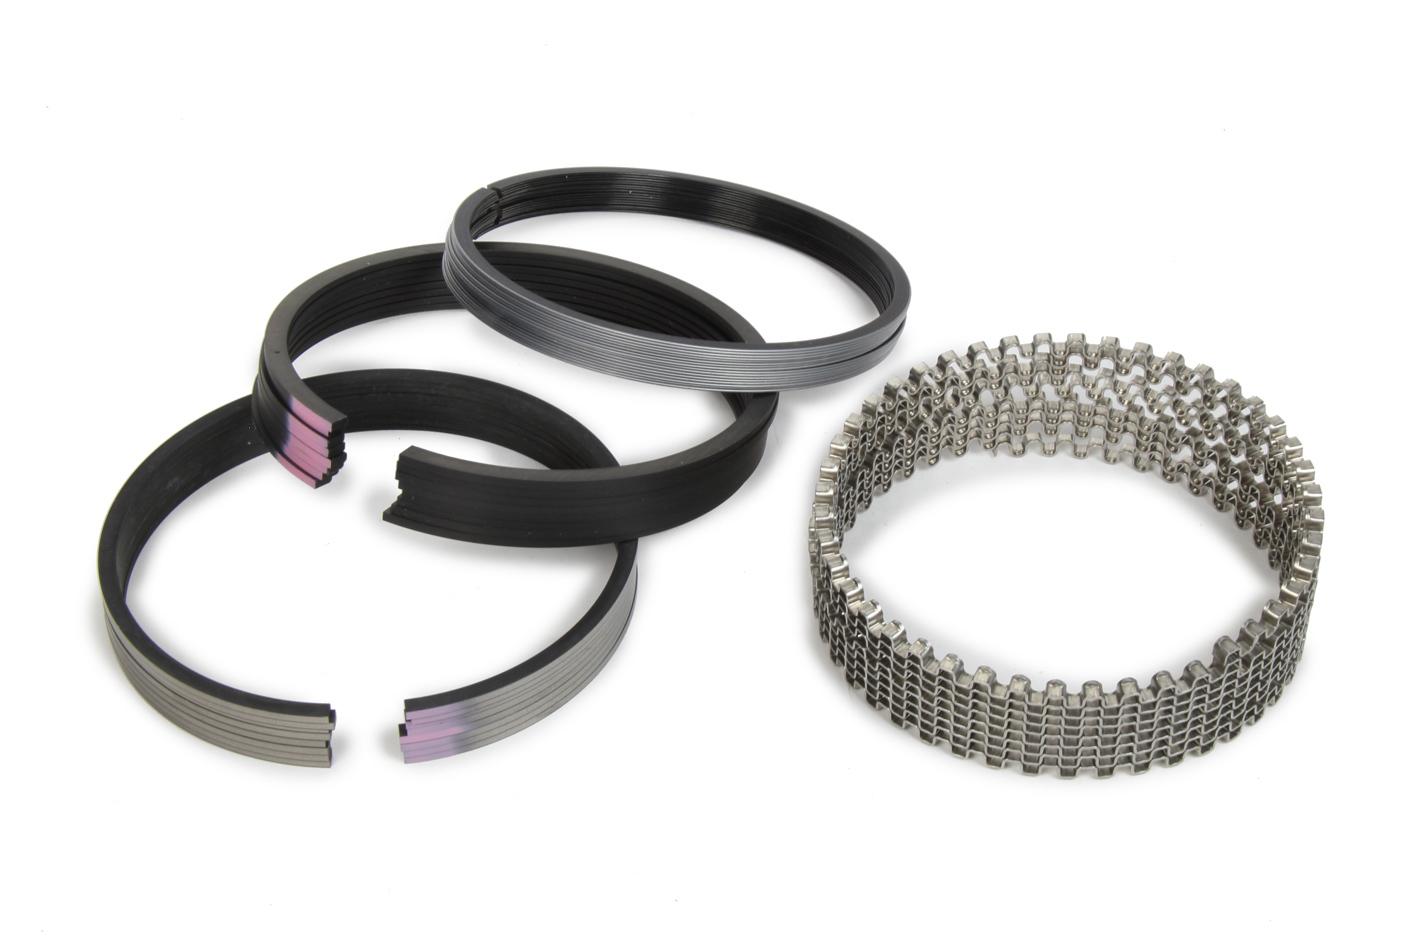 Piston Ring Set 4.030 Moly 5/64 5/64 3/16